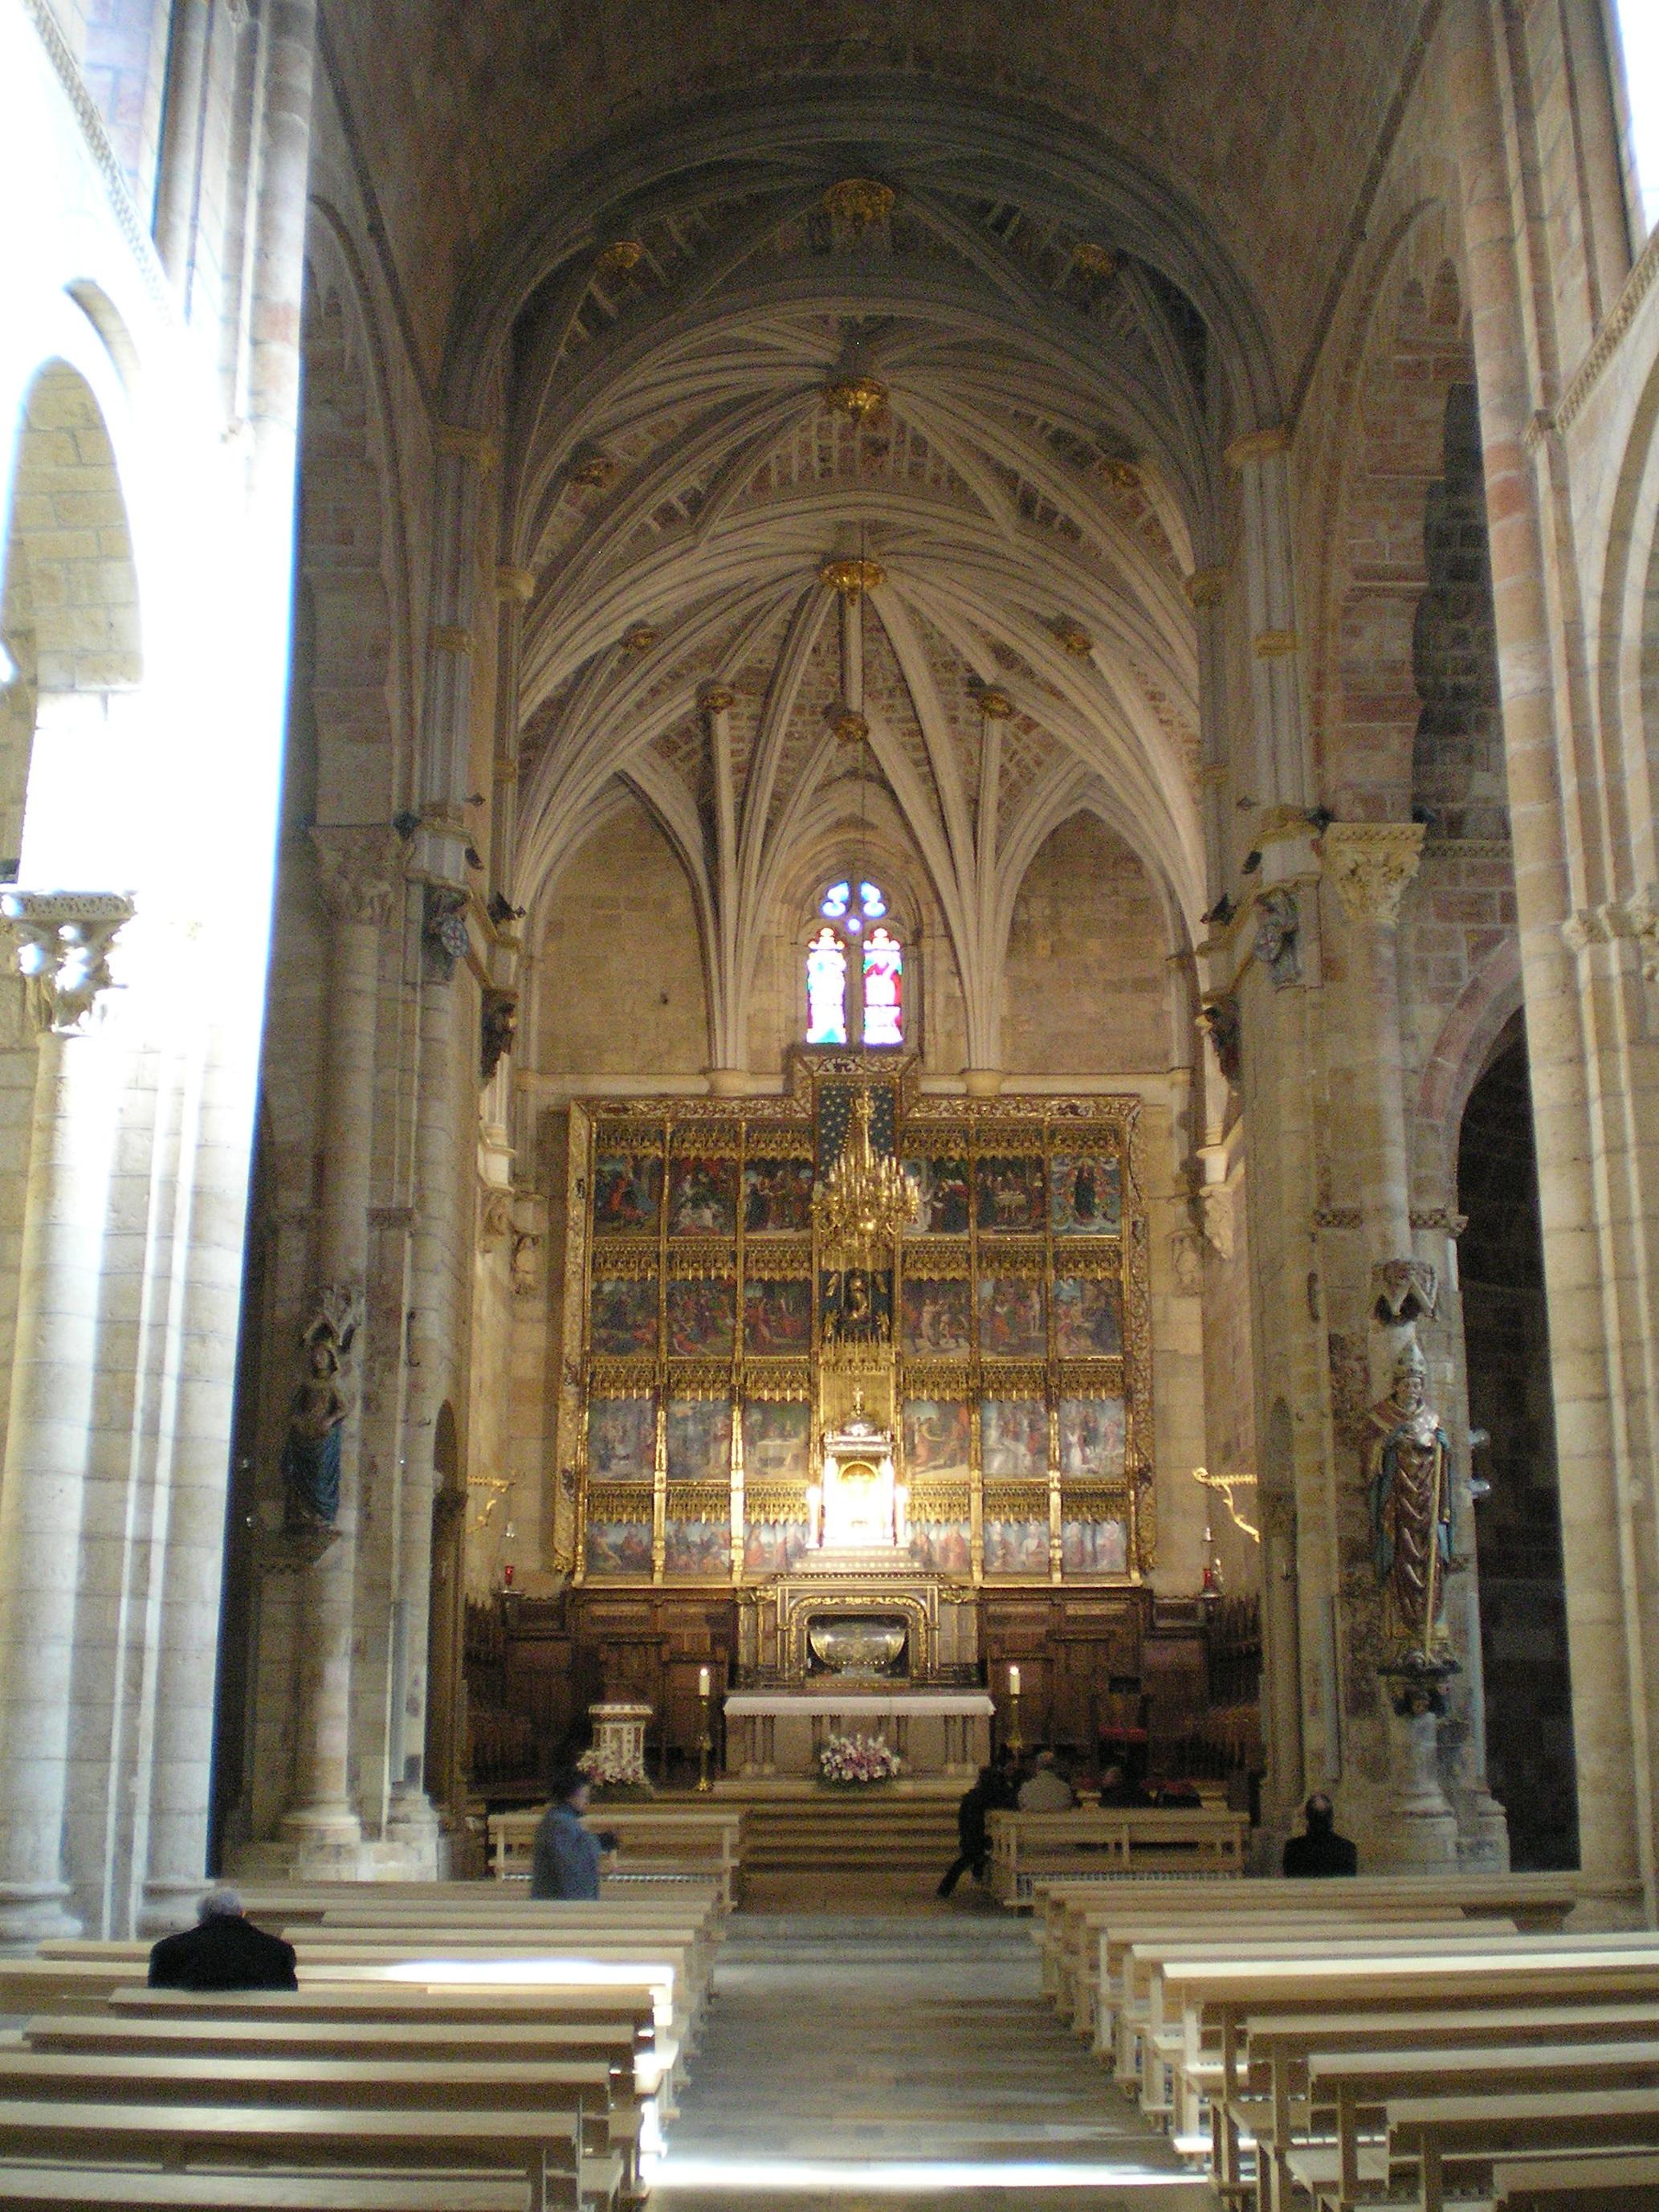 File:Real Colegiata de San Isidoro de León-Interior.jpg - Wikimedia Commons